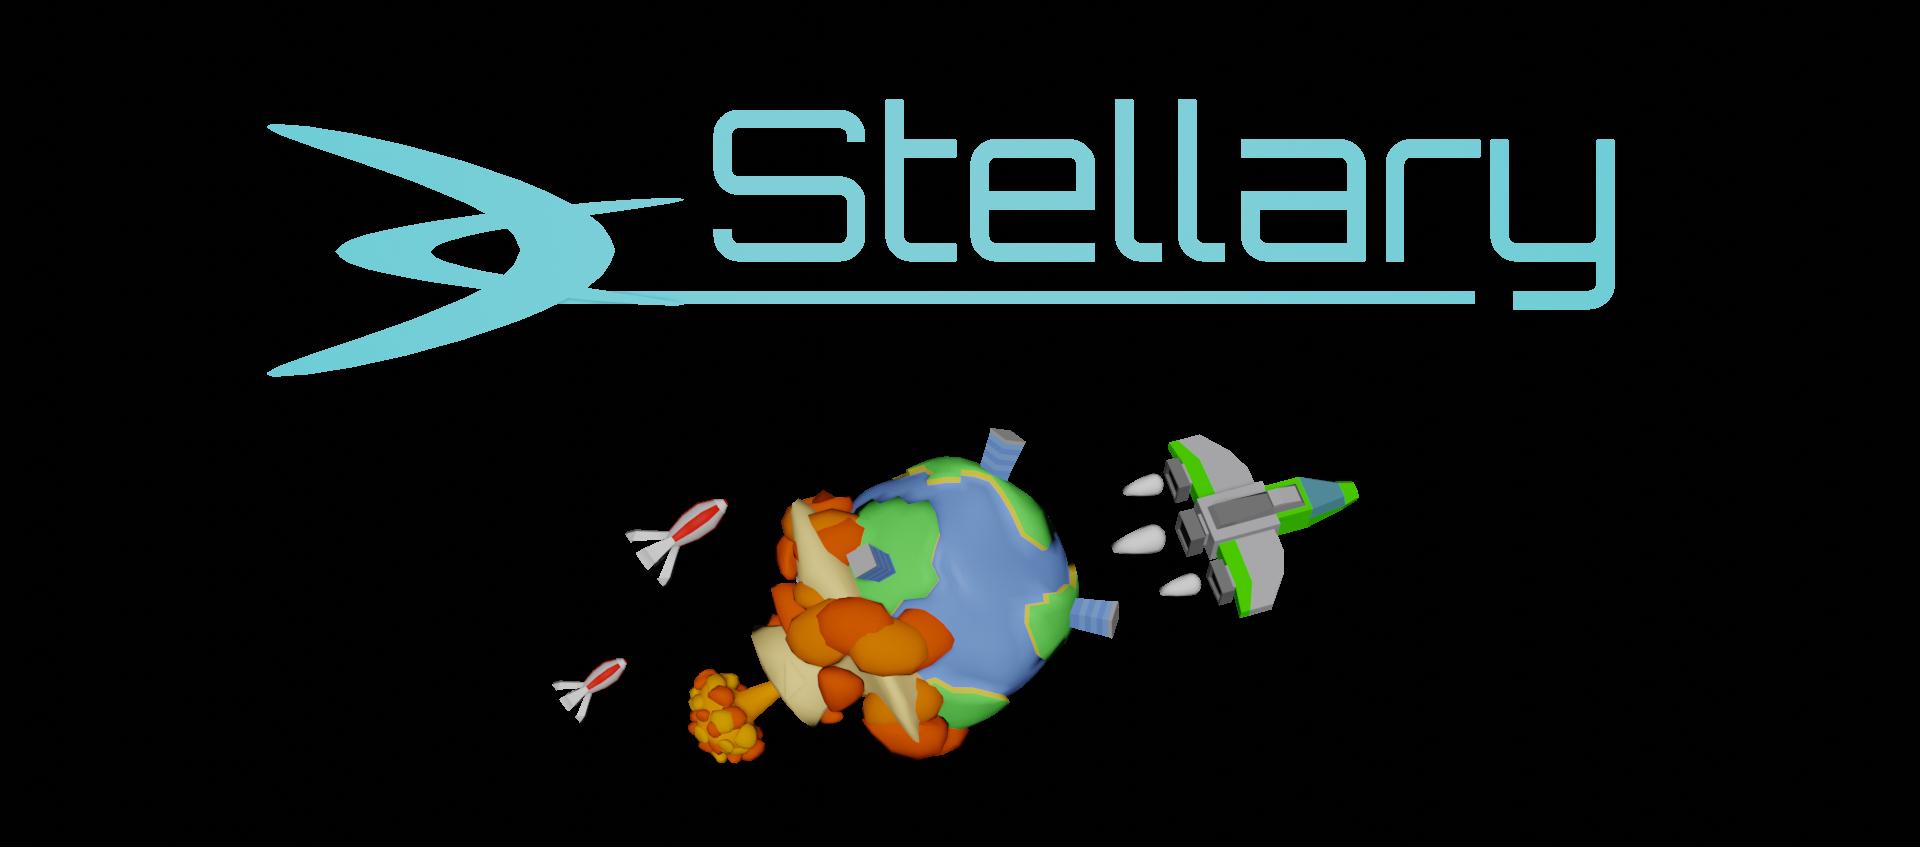 Stellary - Planetary Defense Organisation